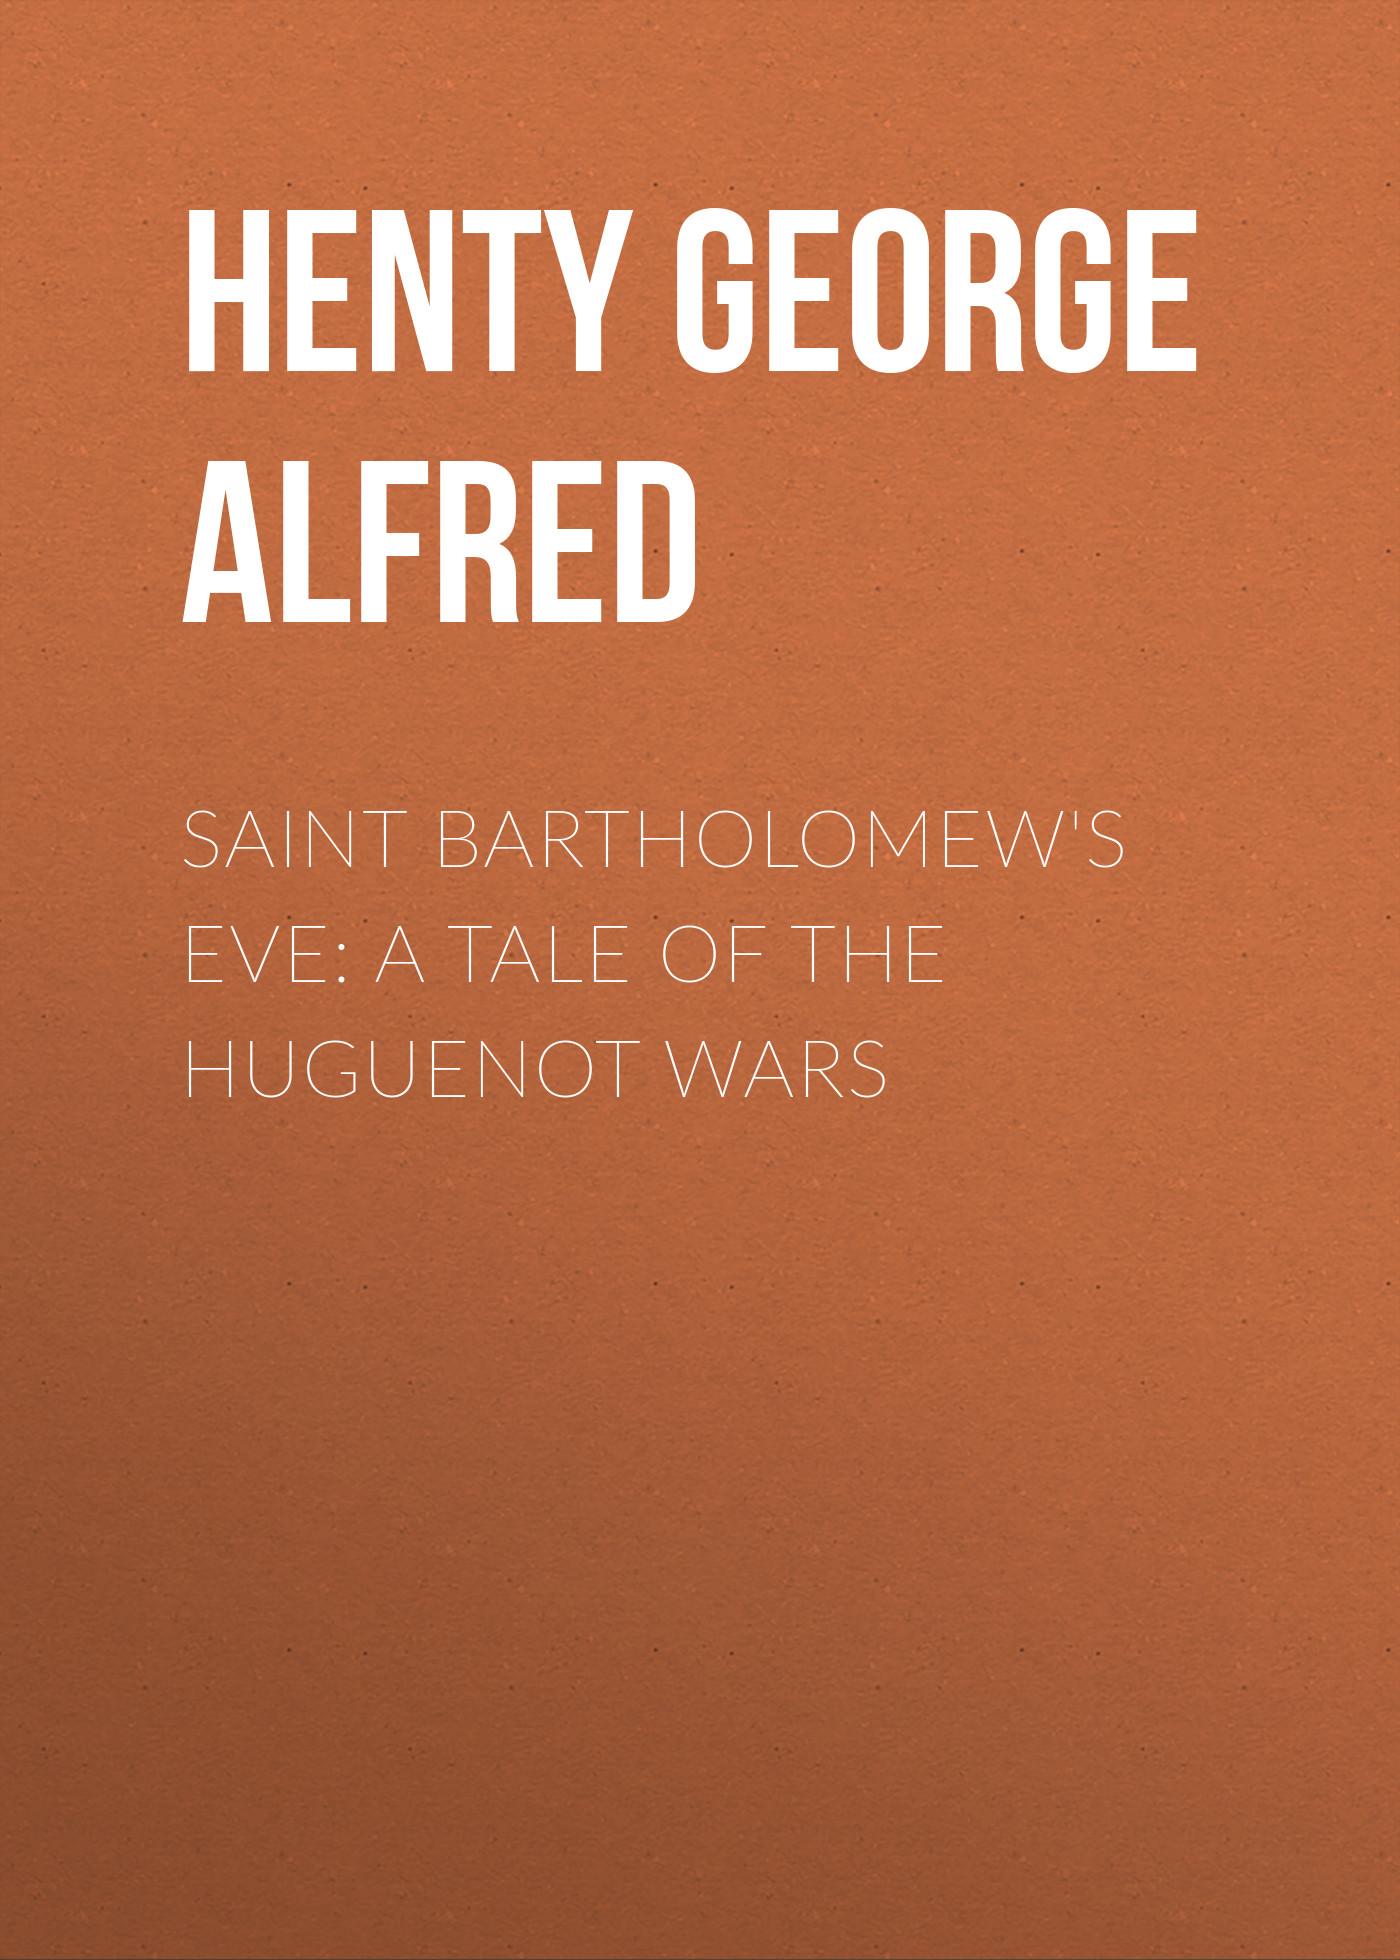 Henty George Alfred Saint Bartholomew's Eve: A Tale of the Huguenot Wars g saint george l ancien rеgime suite no 1